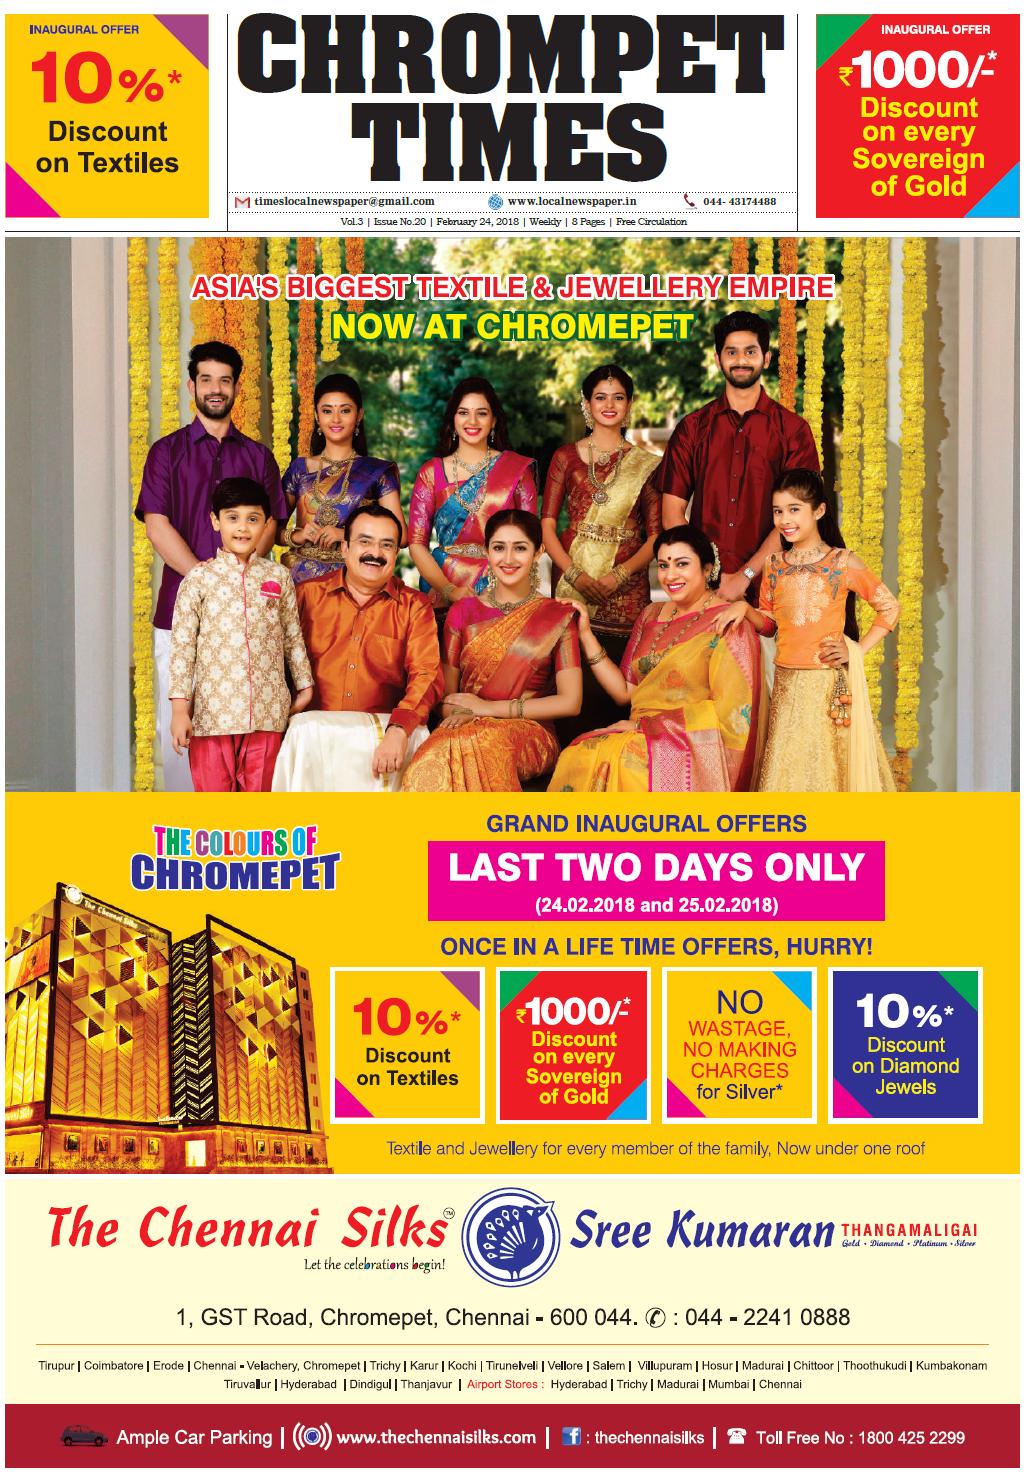 Chennai Silks Chrompet